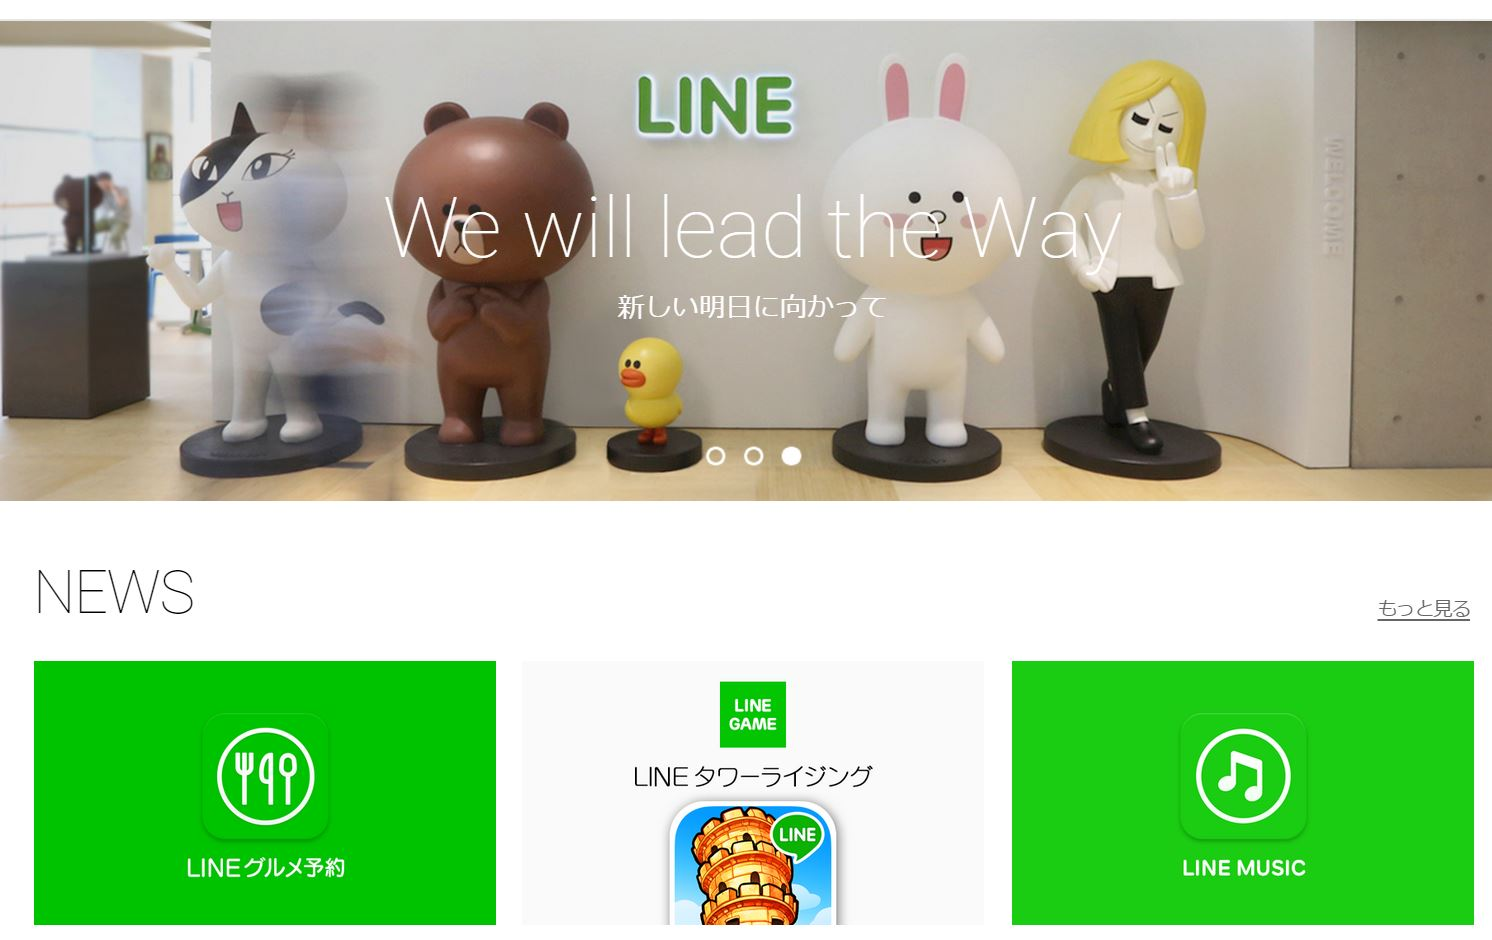 LINEが飲食店のネット予約を開始、人力サービスでアプリ内完結、実名型グルメクチコミの「Retty」とも提携